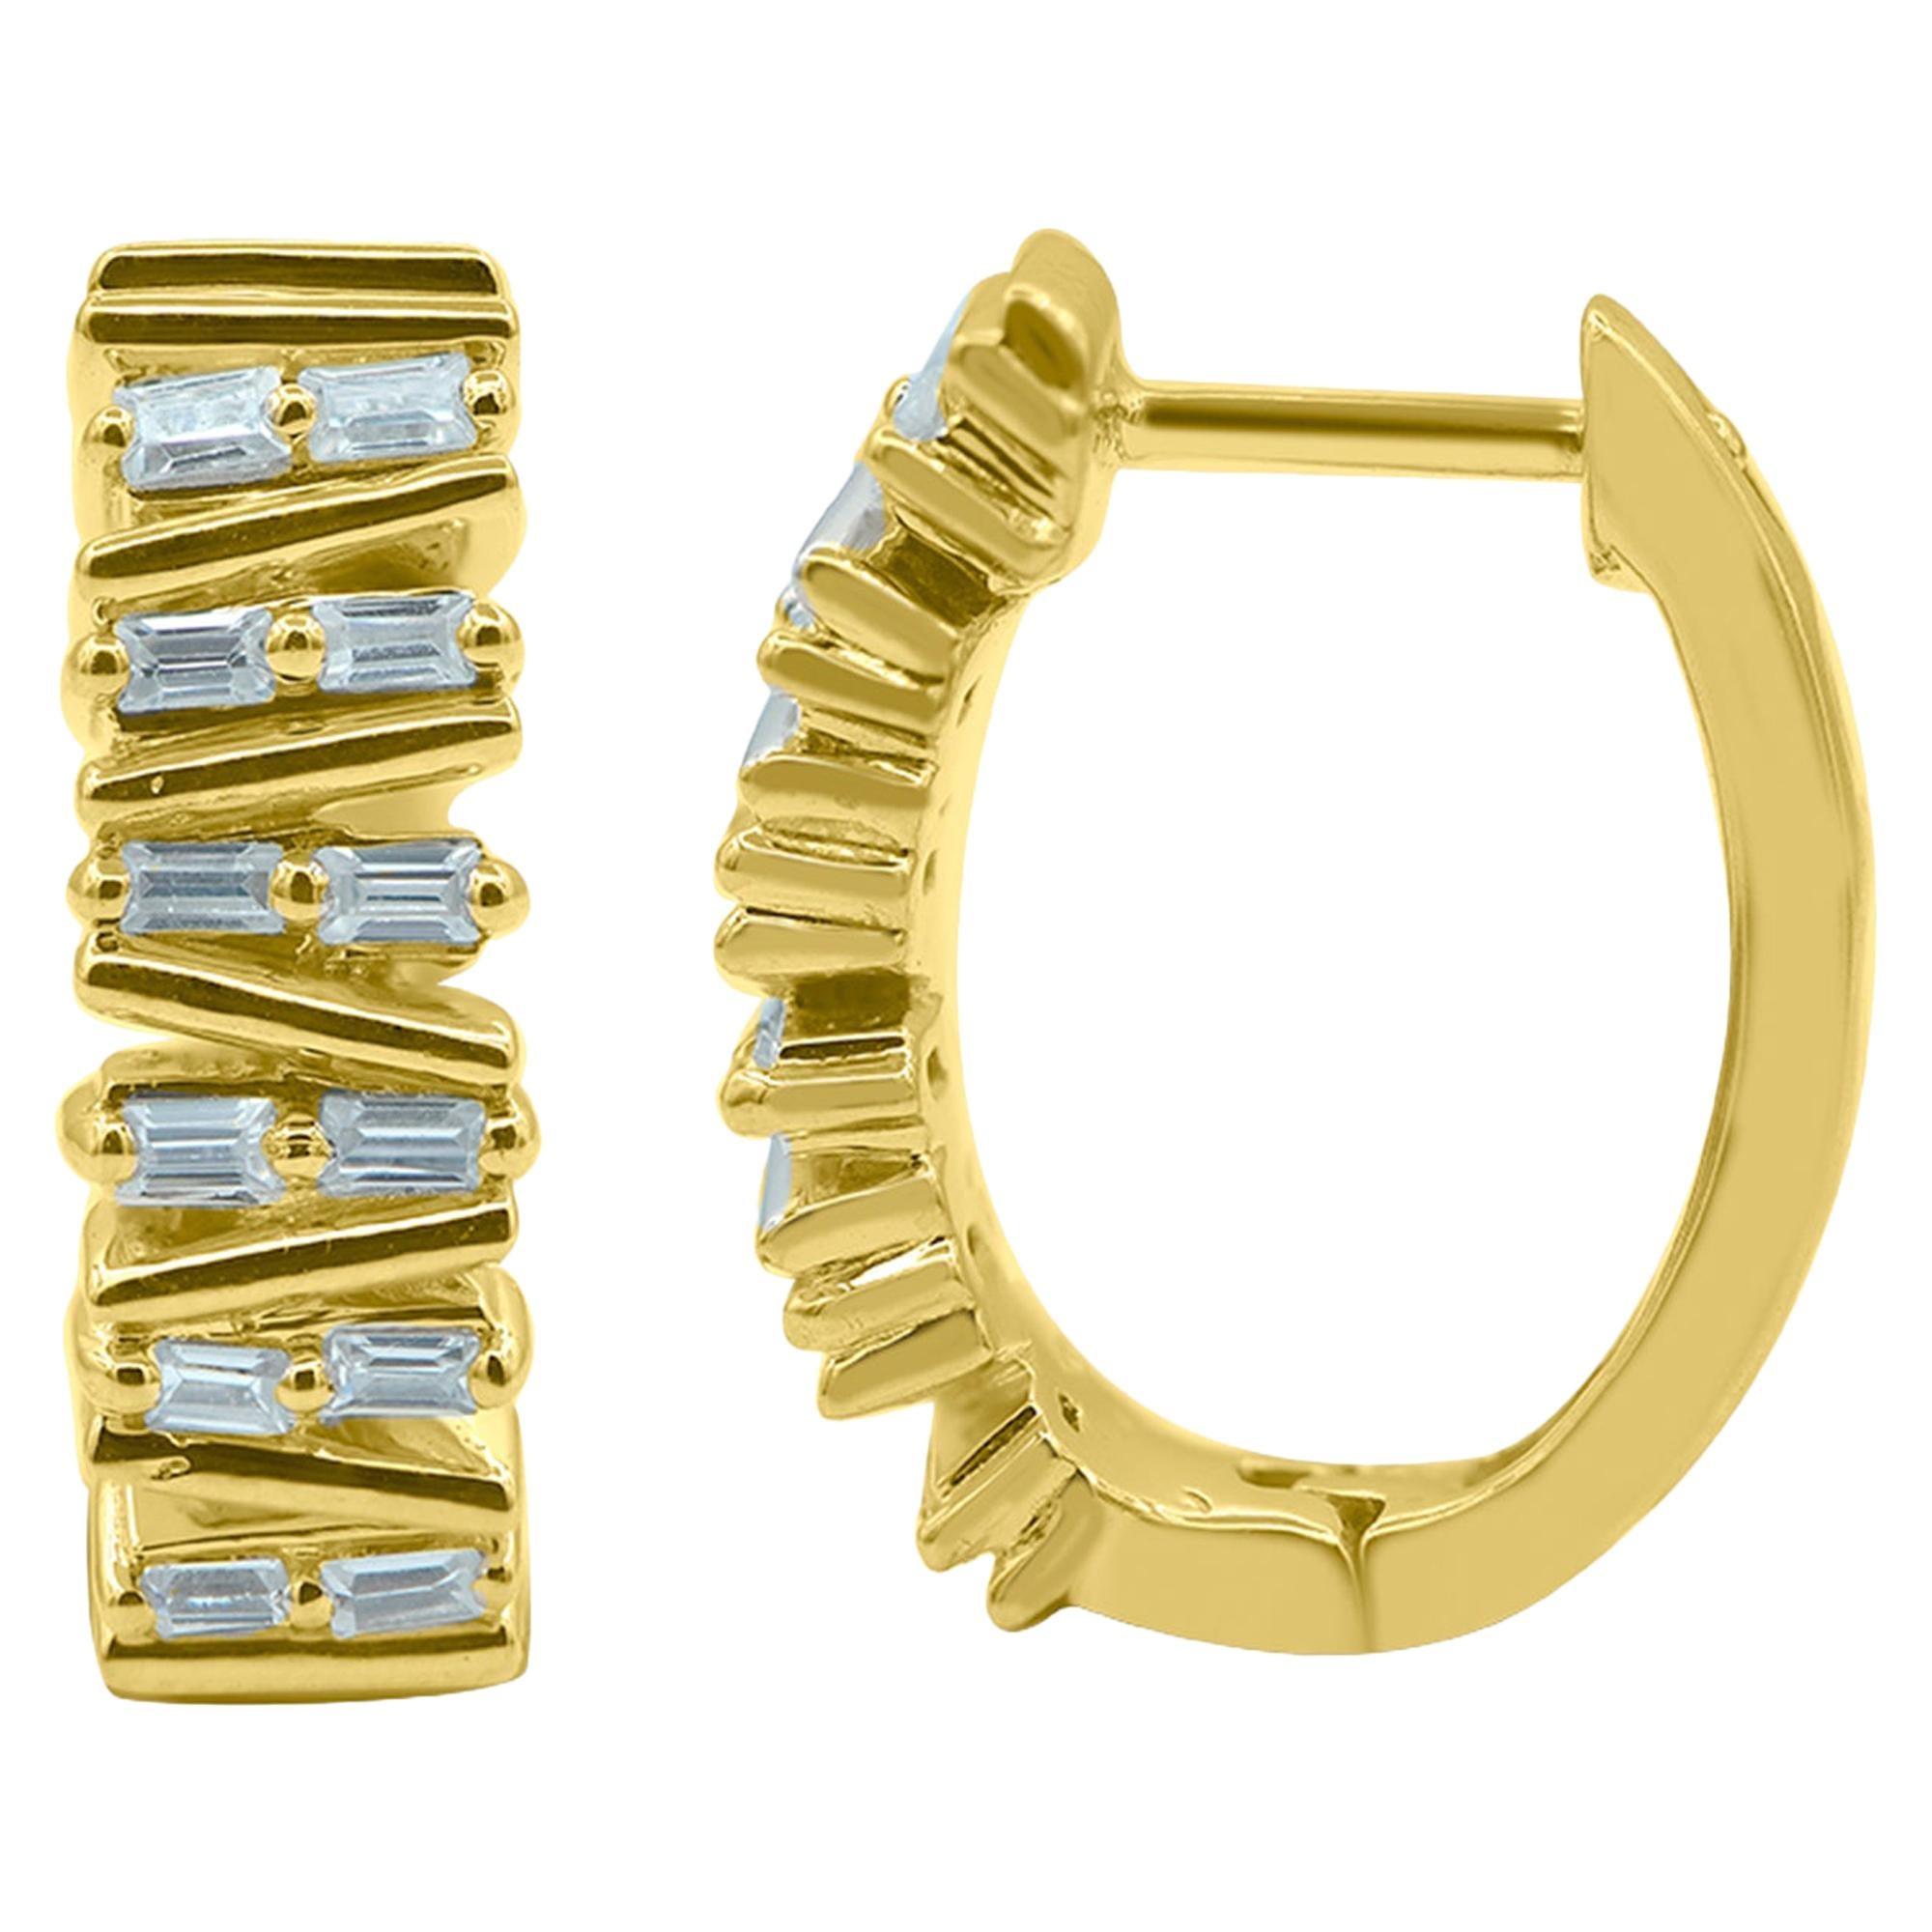 TJD 0.25 Carat Baguette Diamond 14K Yellow Gold Designer Fashion Hoop Earrings